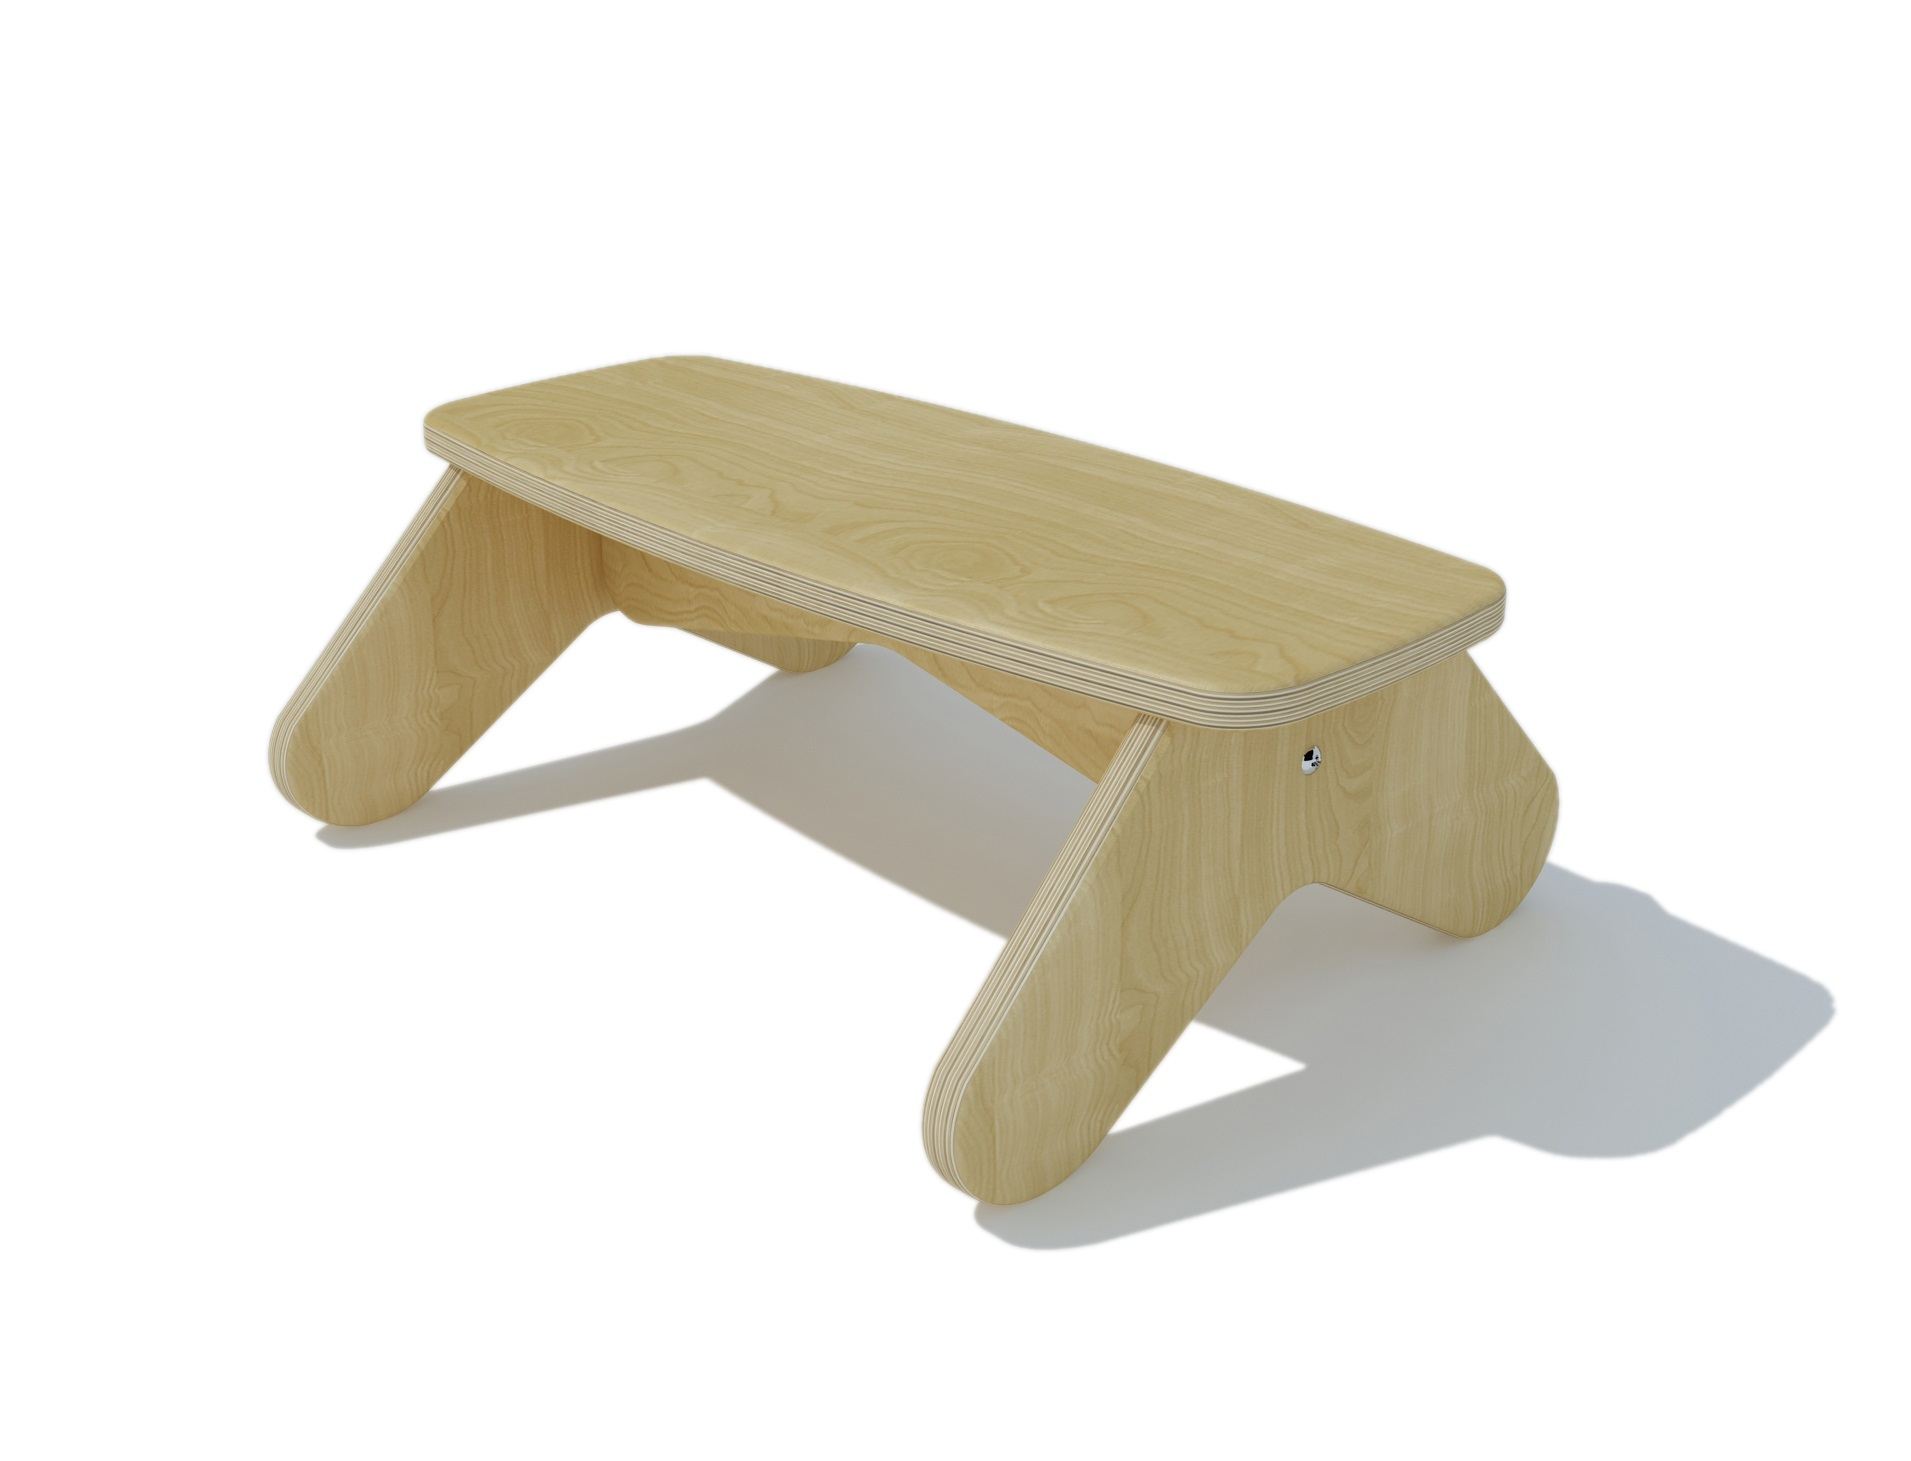 sodura step stool